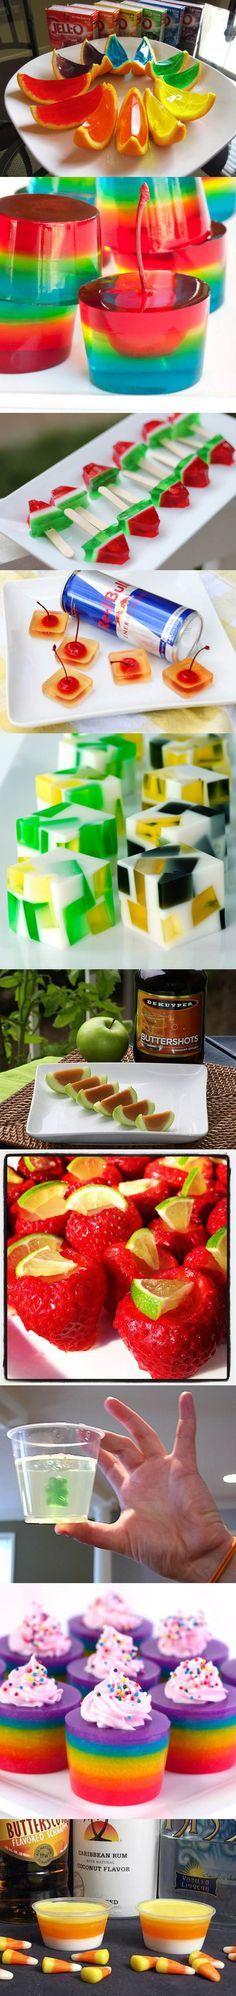 10 different ways to do jello shots